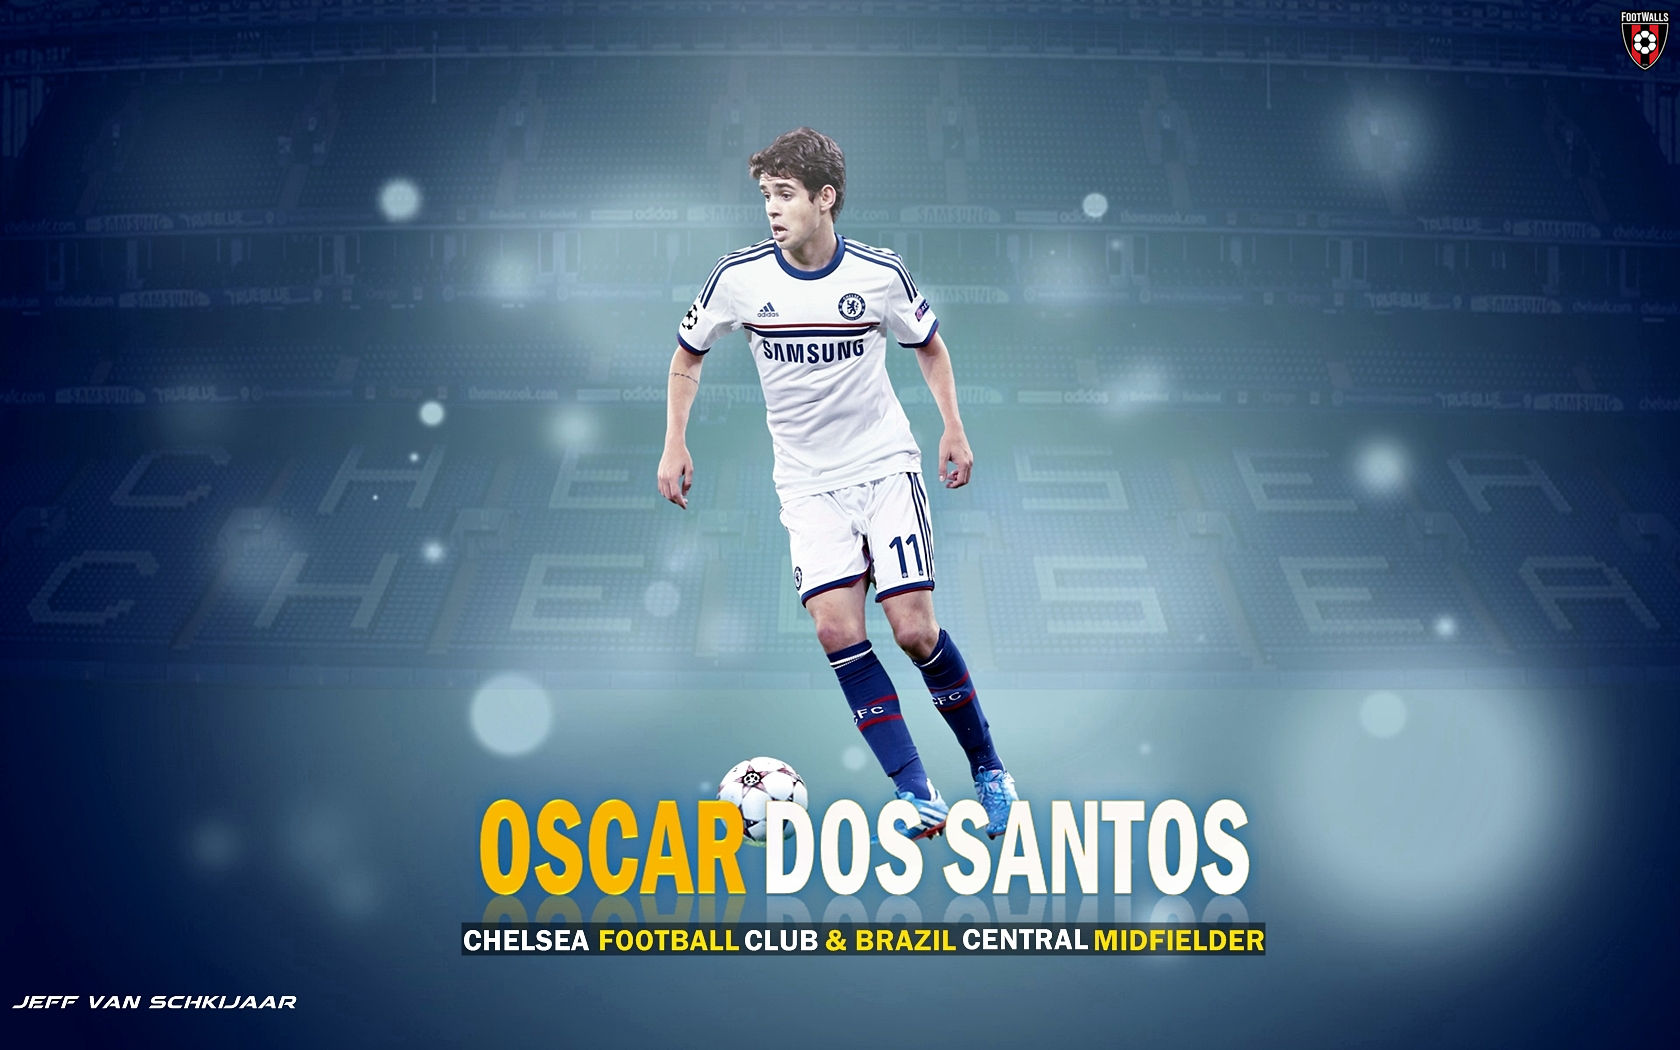 Oscar Dos Santos Wallpaper 3   1680 X 1050 stmednet 1680x1050